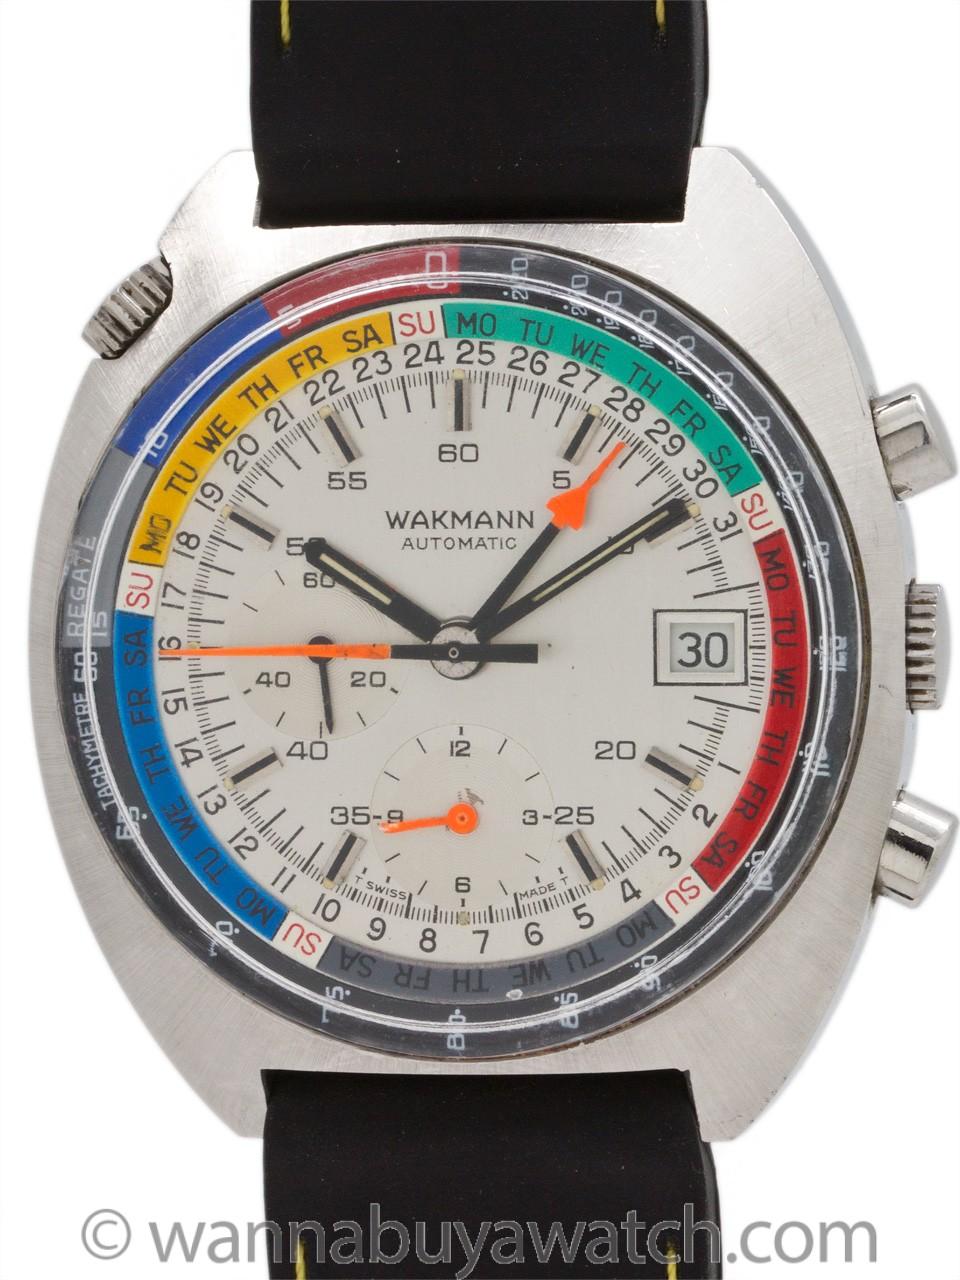 Wakmann Oversize Automatic Regate Chronograph circa 1960's